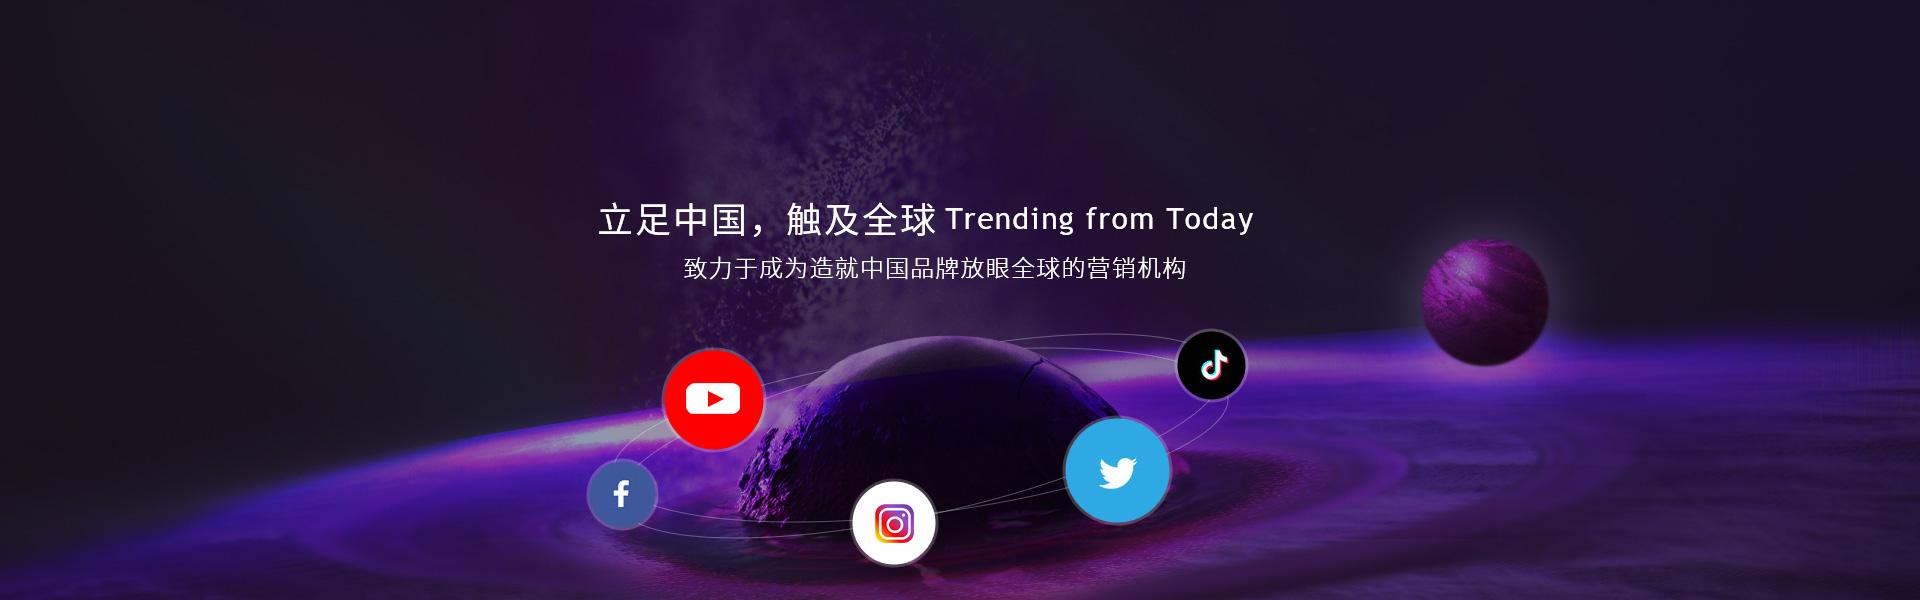 hotlist热点营销-立足中国,触及全球